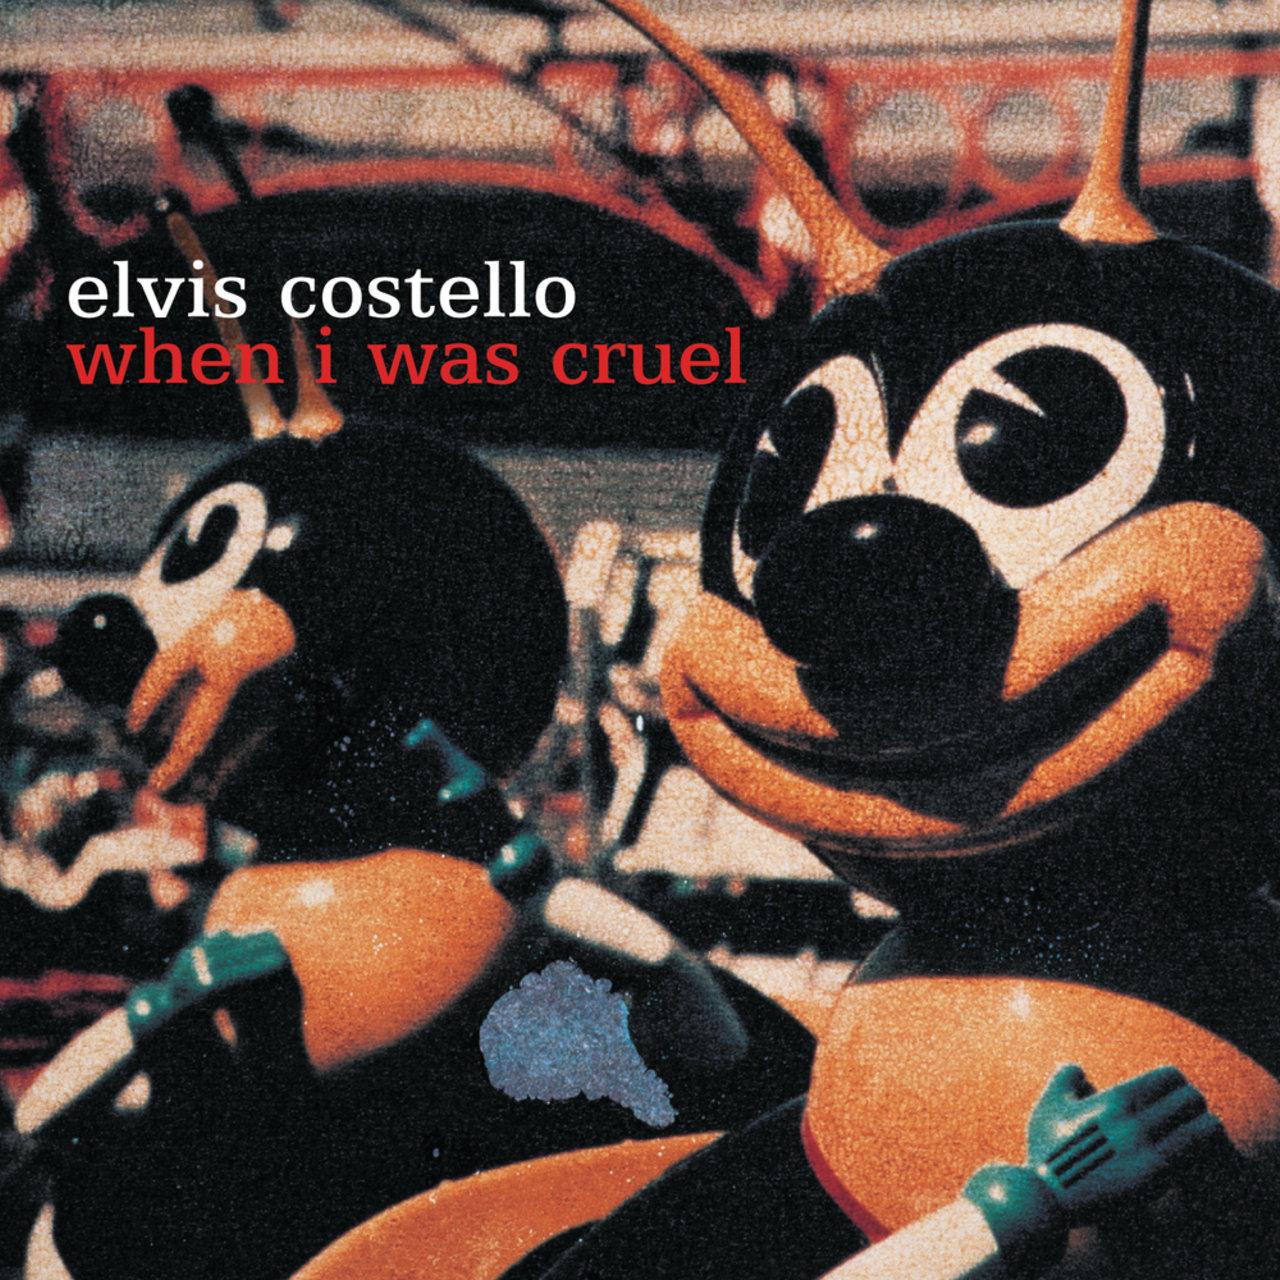 elvis costello - Producer/Mixer